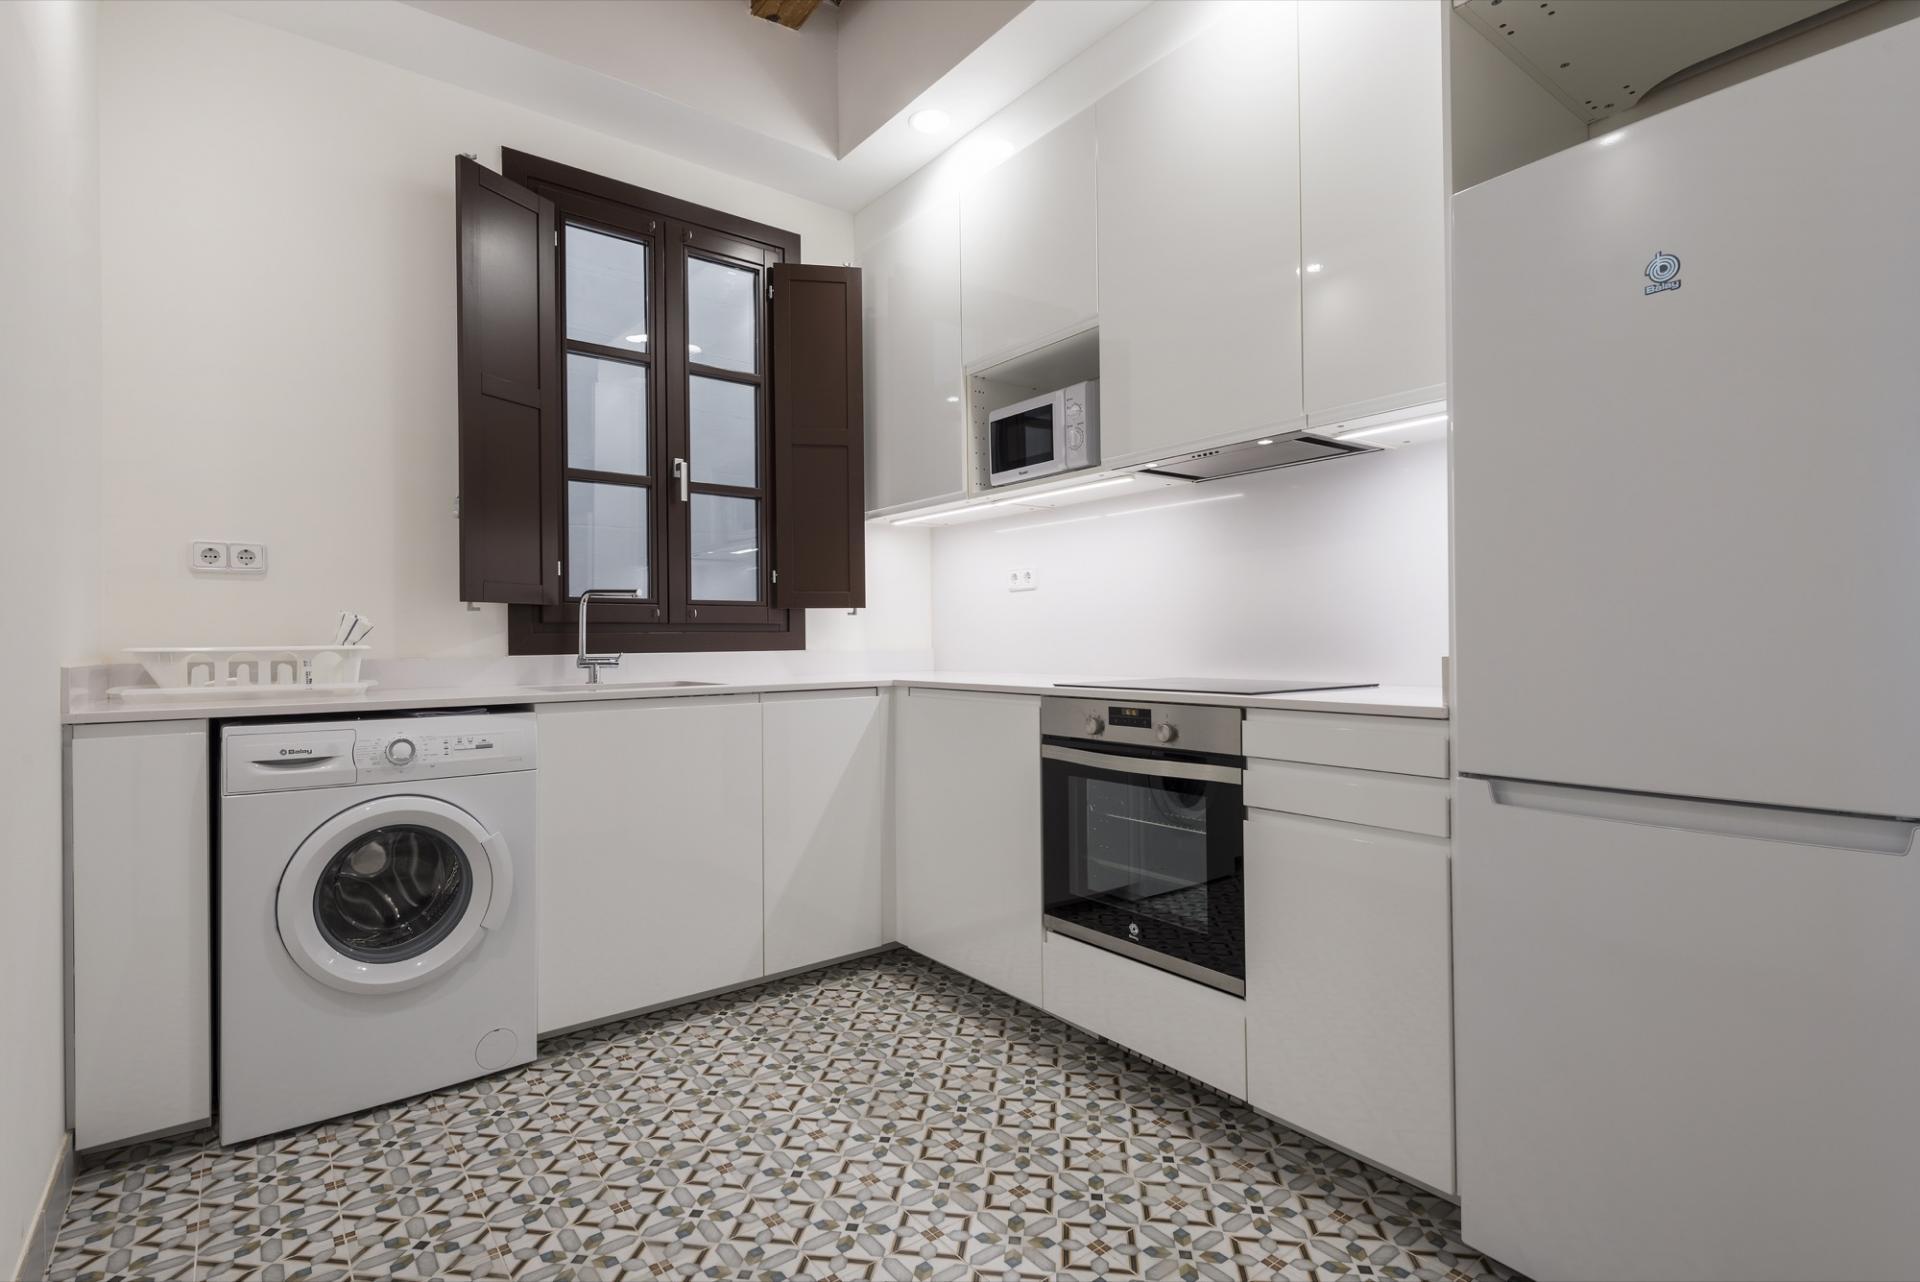 Kitchen at Pelayo Suites, El Raval, Barcelona - Citybase Apartments